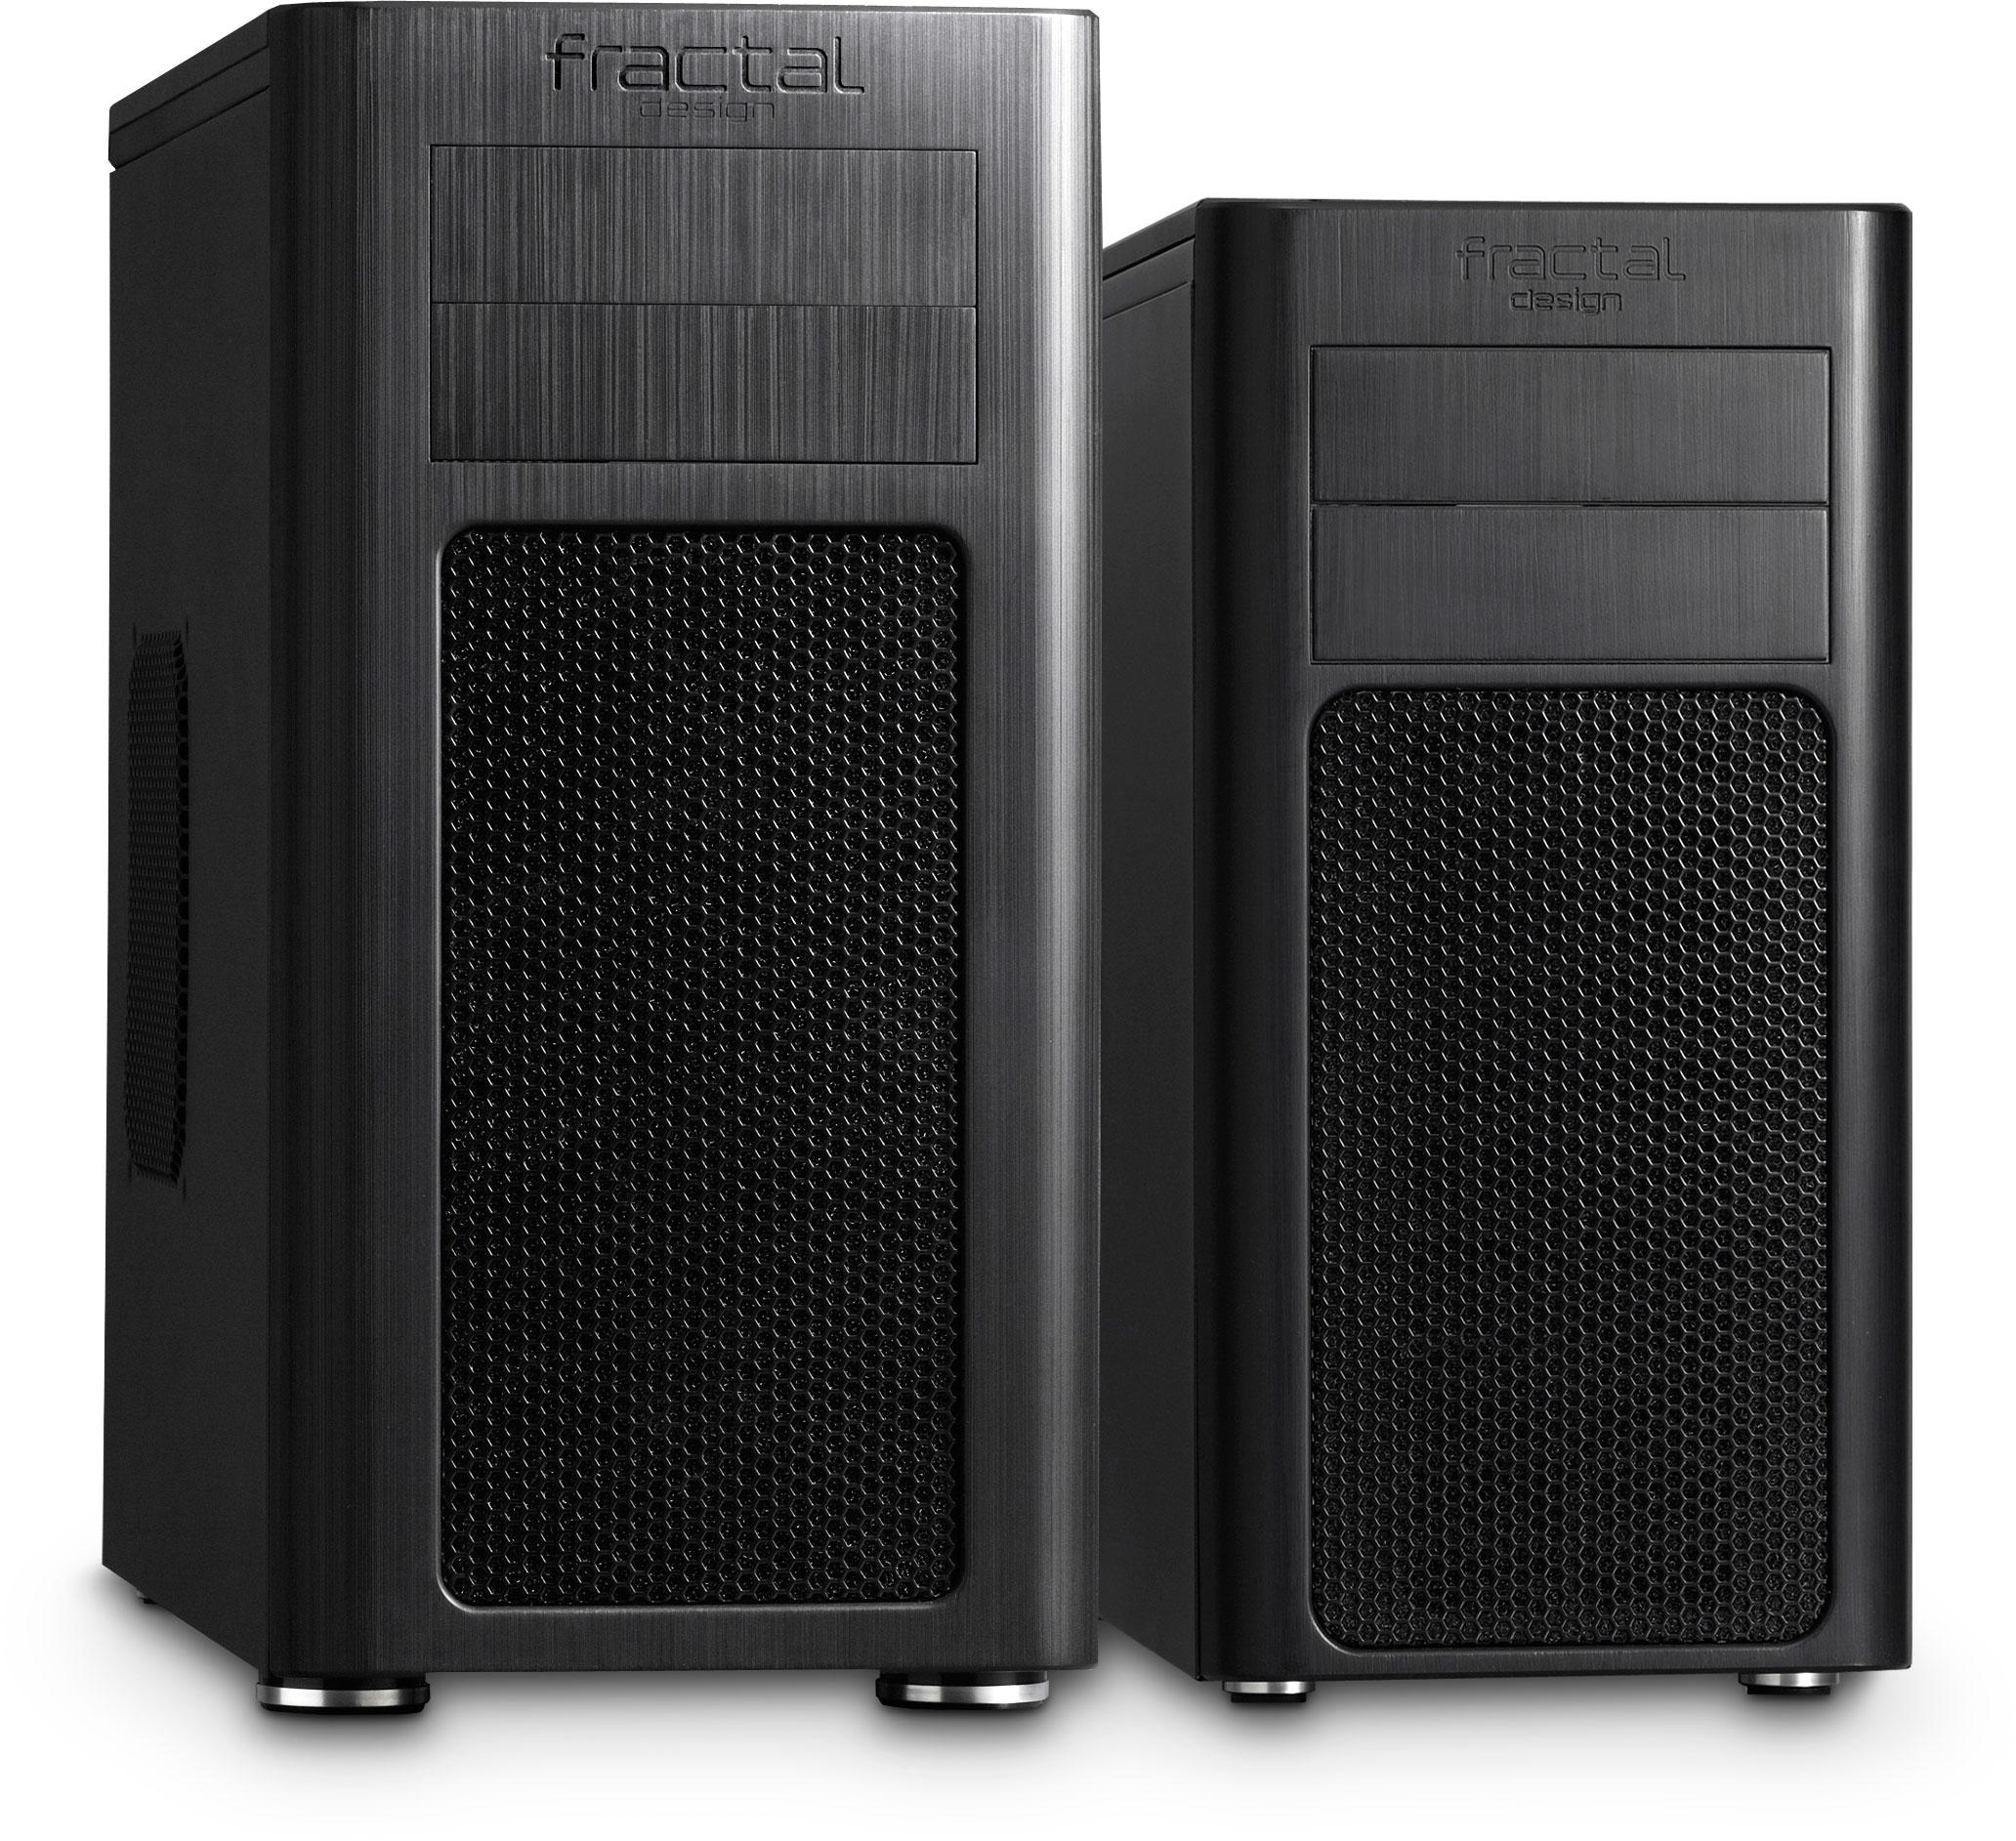 Fractal Design Arc Series Computer Cases